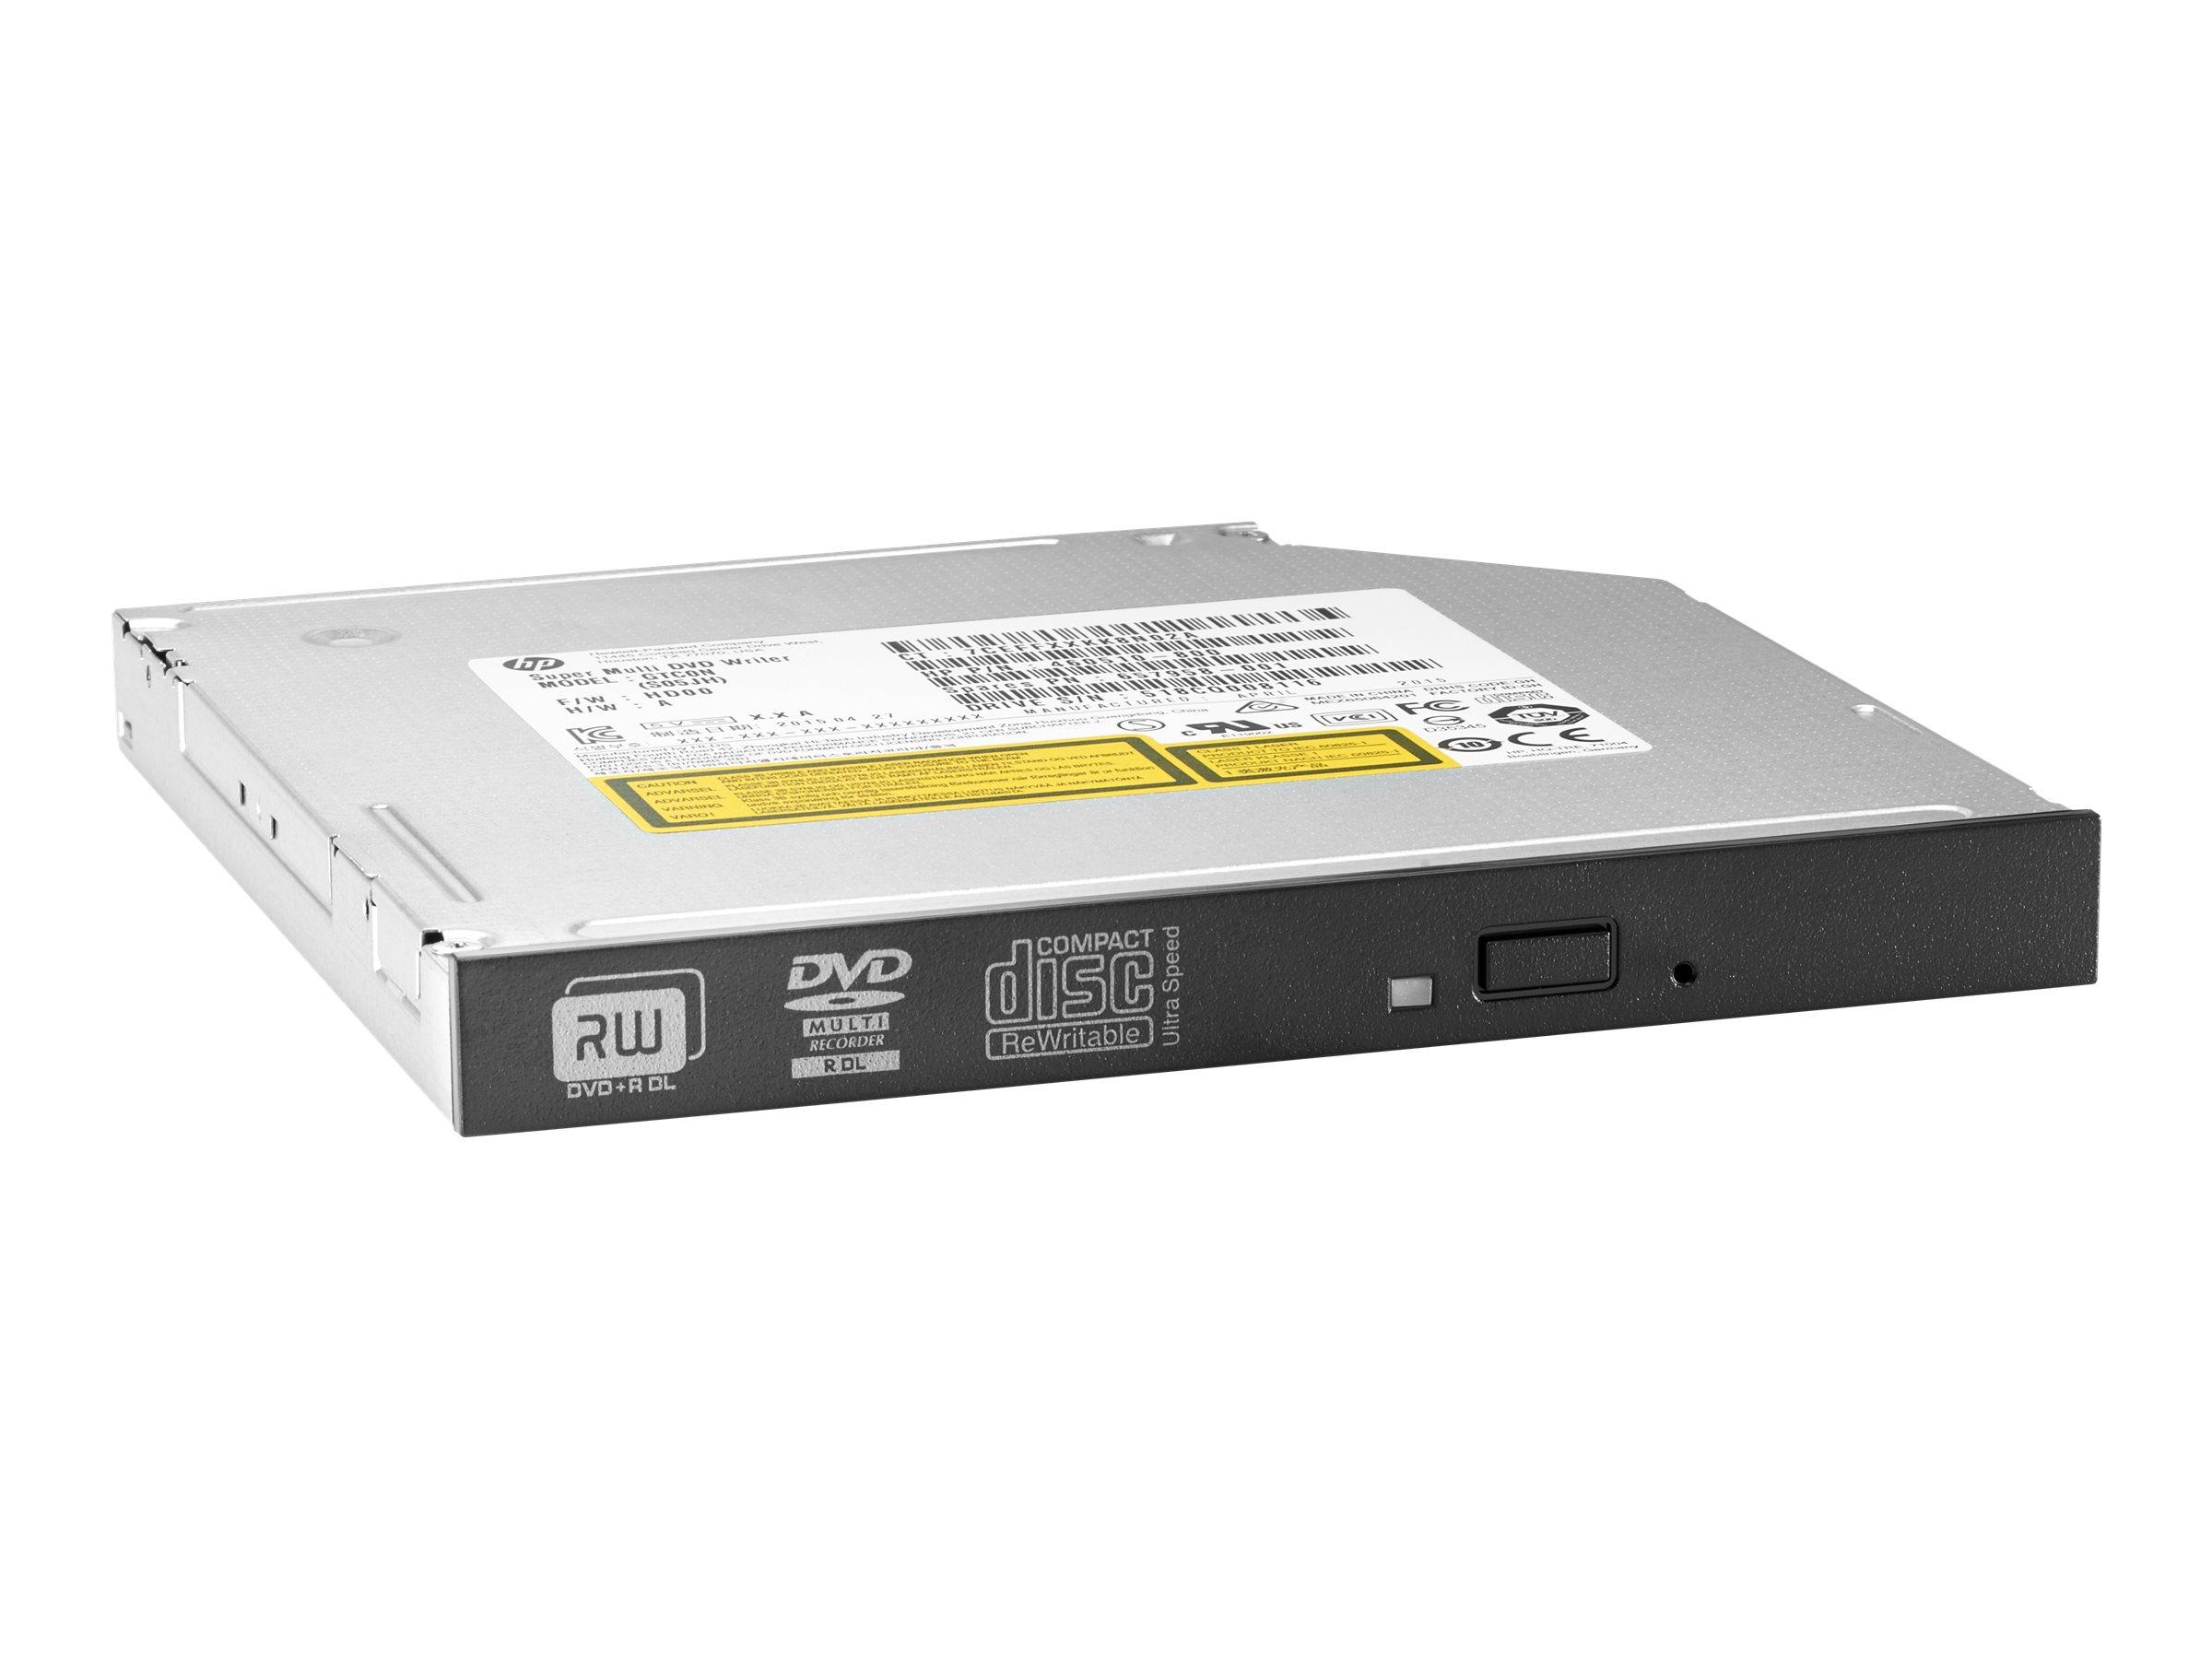 HP Slim - Laufwerk - DVD±RW (±R DL) / DVD-RAM - 8x/8x/5x - Serial ATA - intern